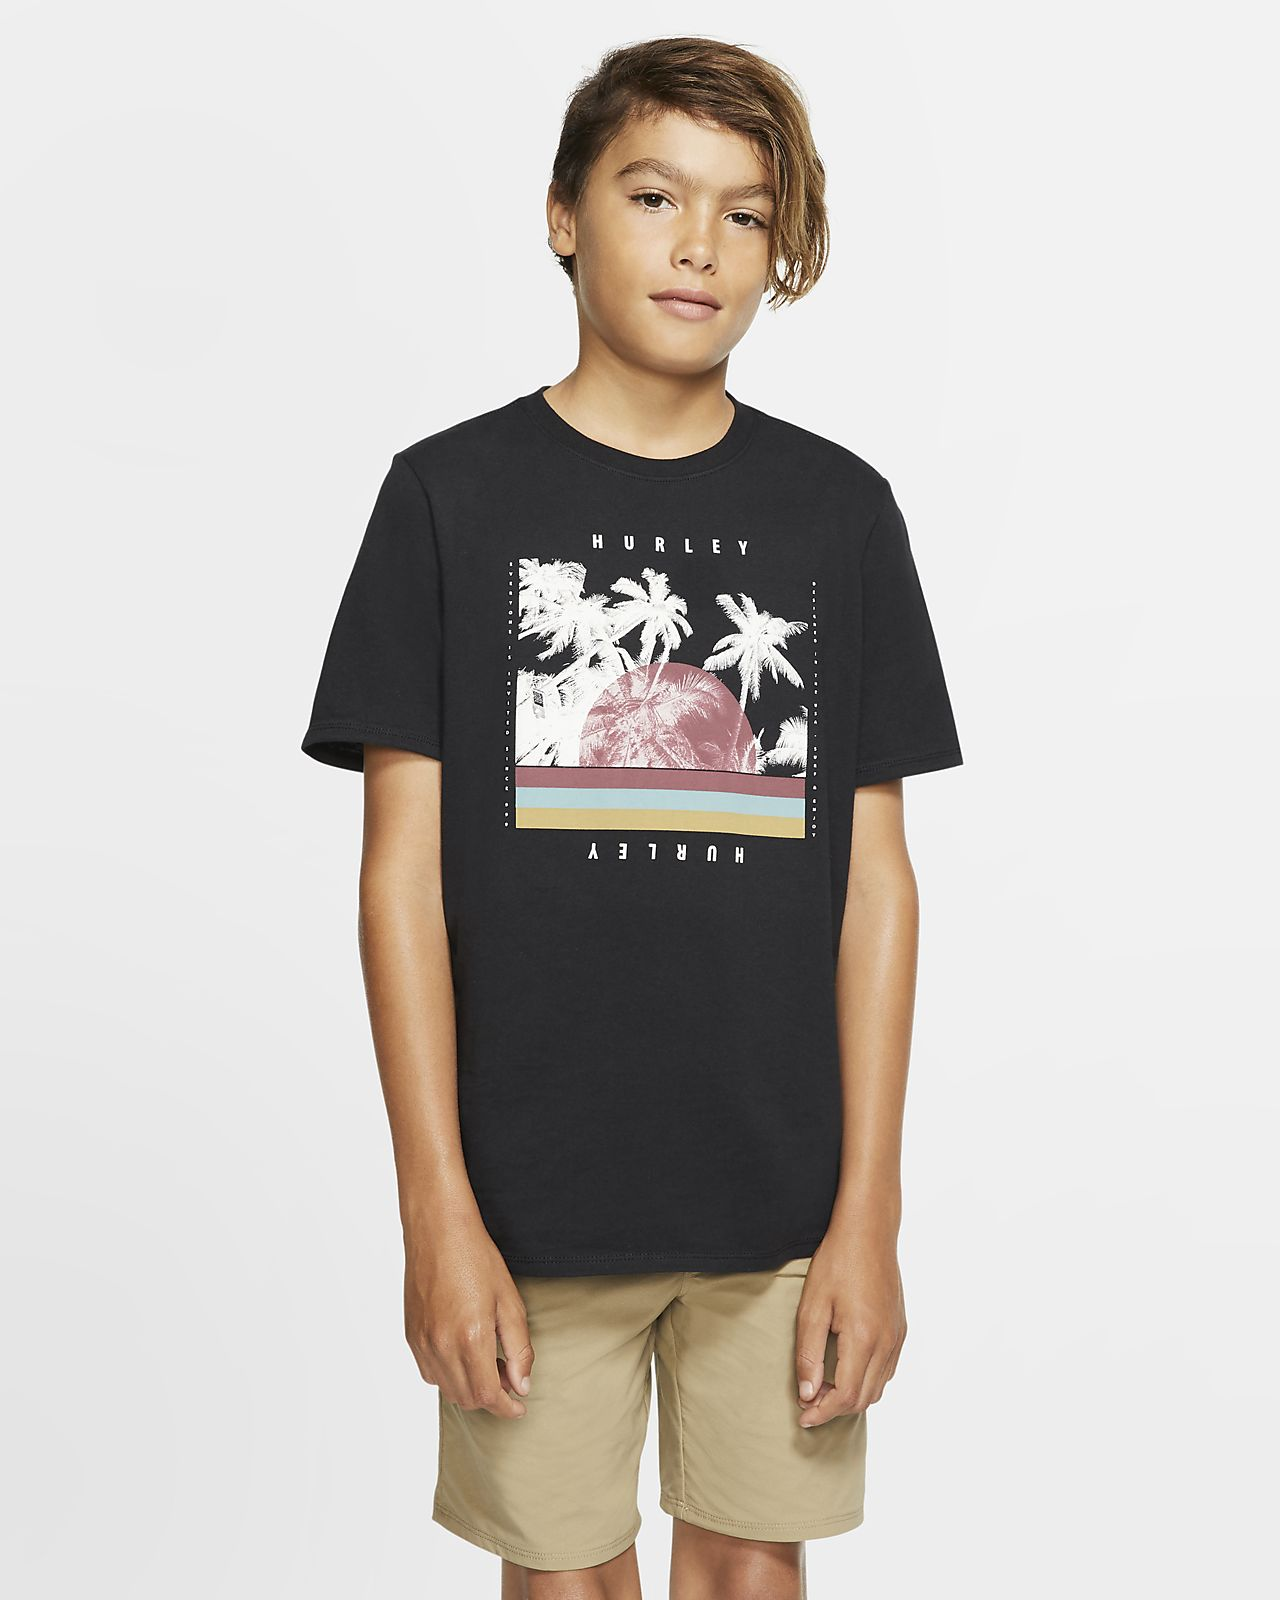 Hurley Premium Palm Retro Boys' Premium Fit T-Shirt